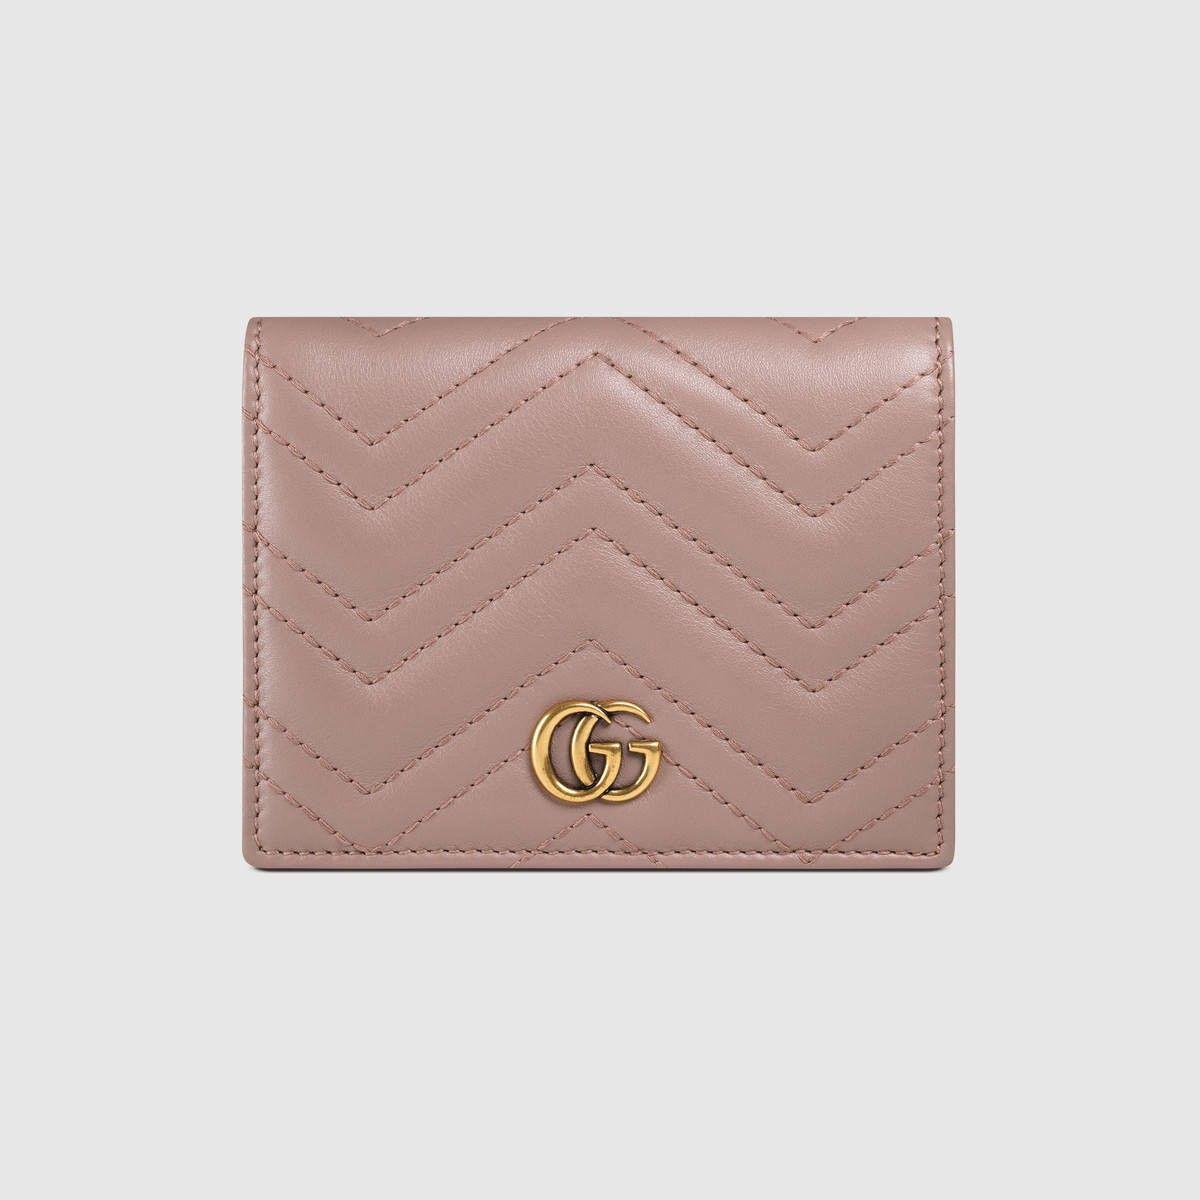 1c557af24 GUCCI Gg Marmont Card Case - Nude Matelassé Leather. #gucci #bags #leather #